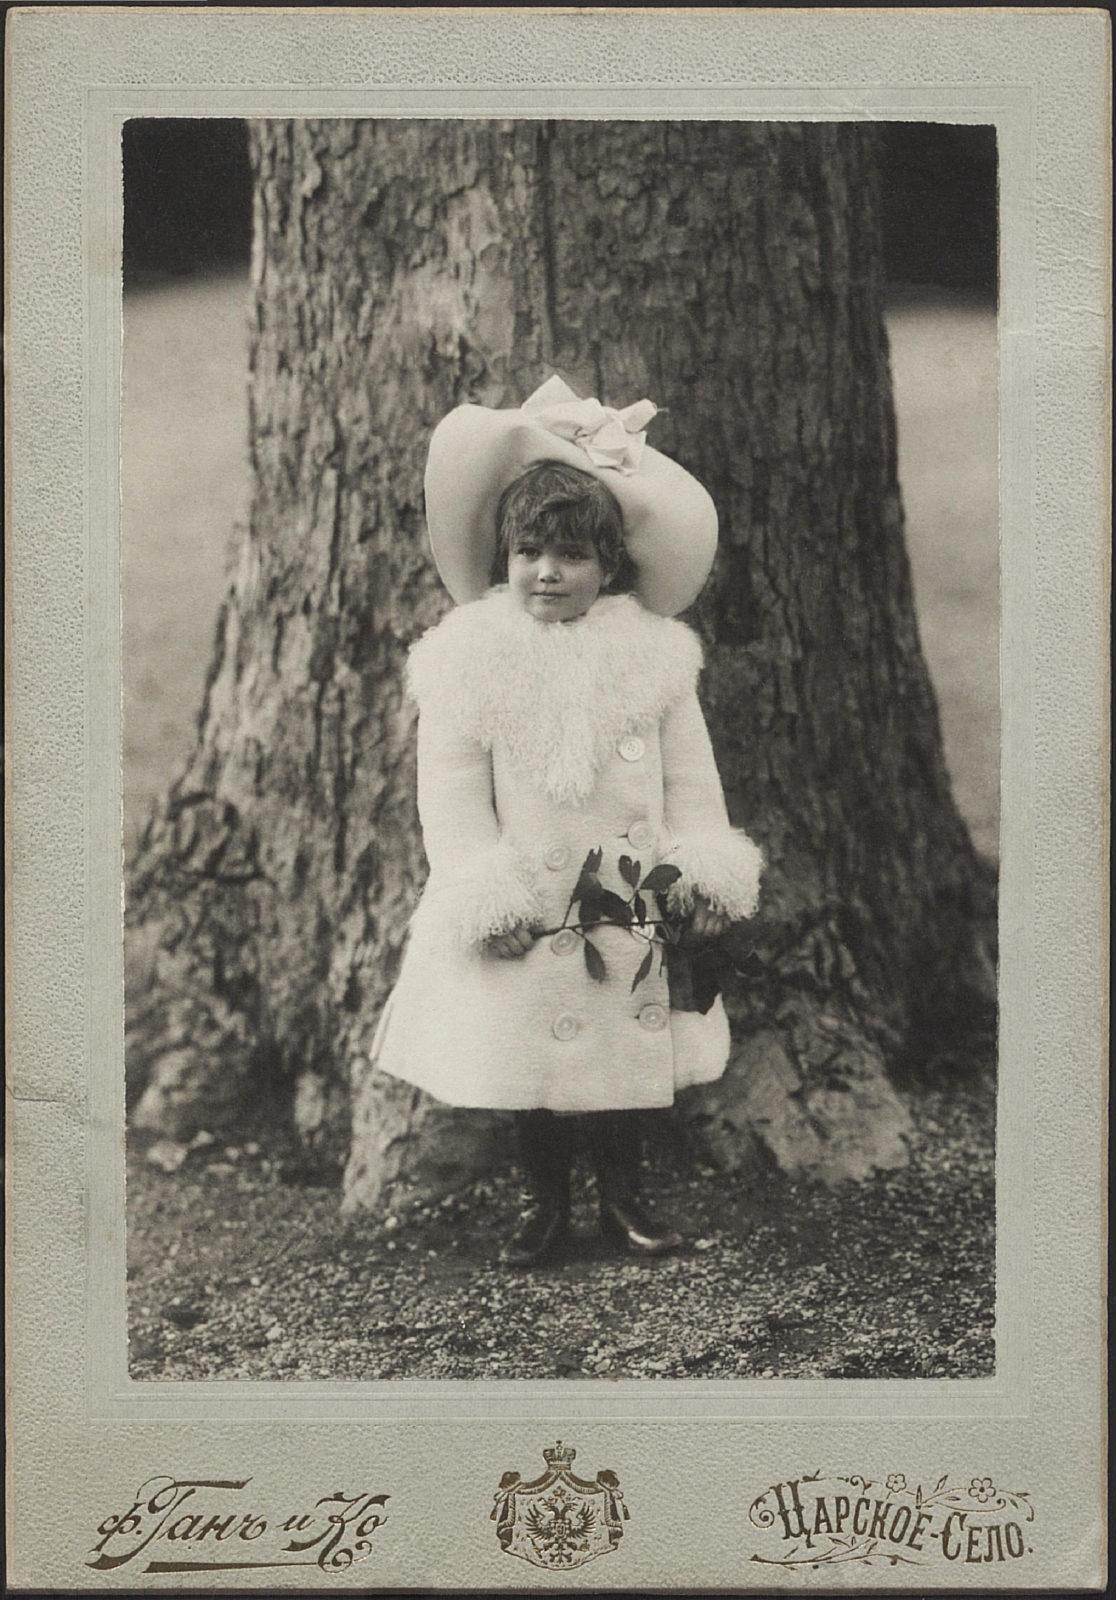 Grand Duchess Maria Nikolaevna. The third daughter of Emperor Nicholas II and Empress Alexandra Feodorovna. Tsarskoe Selo.